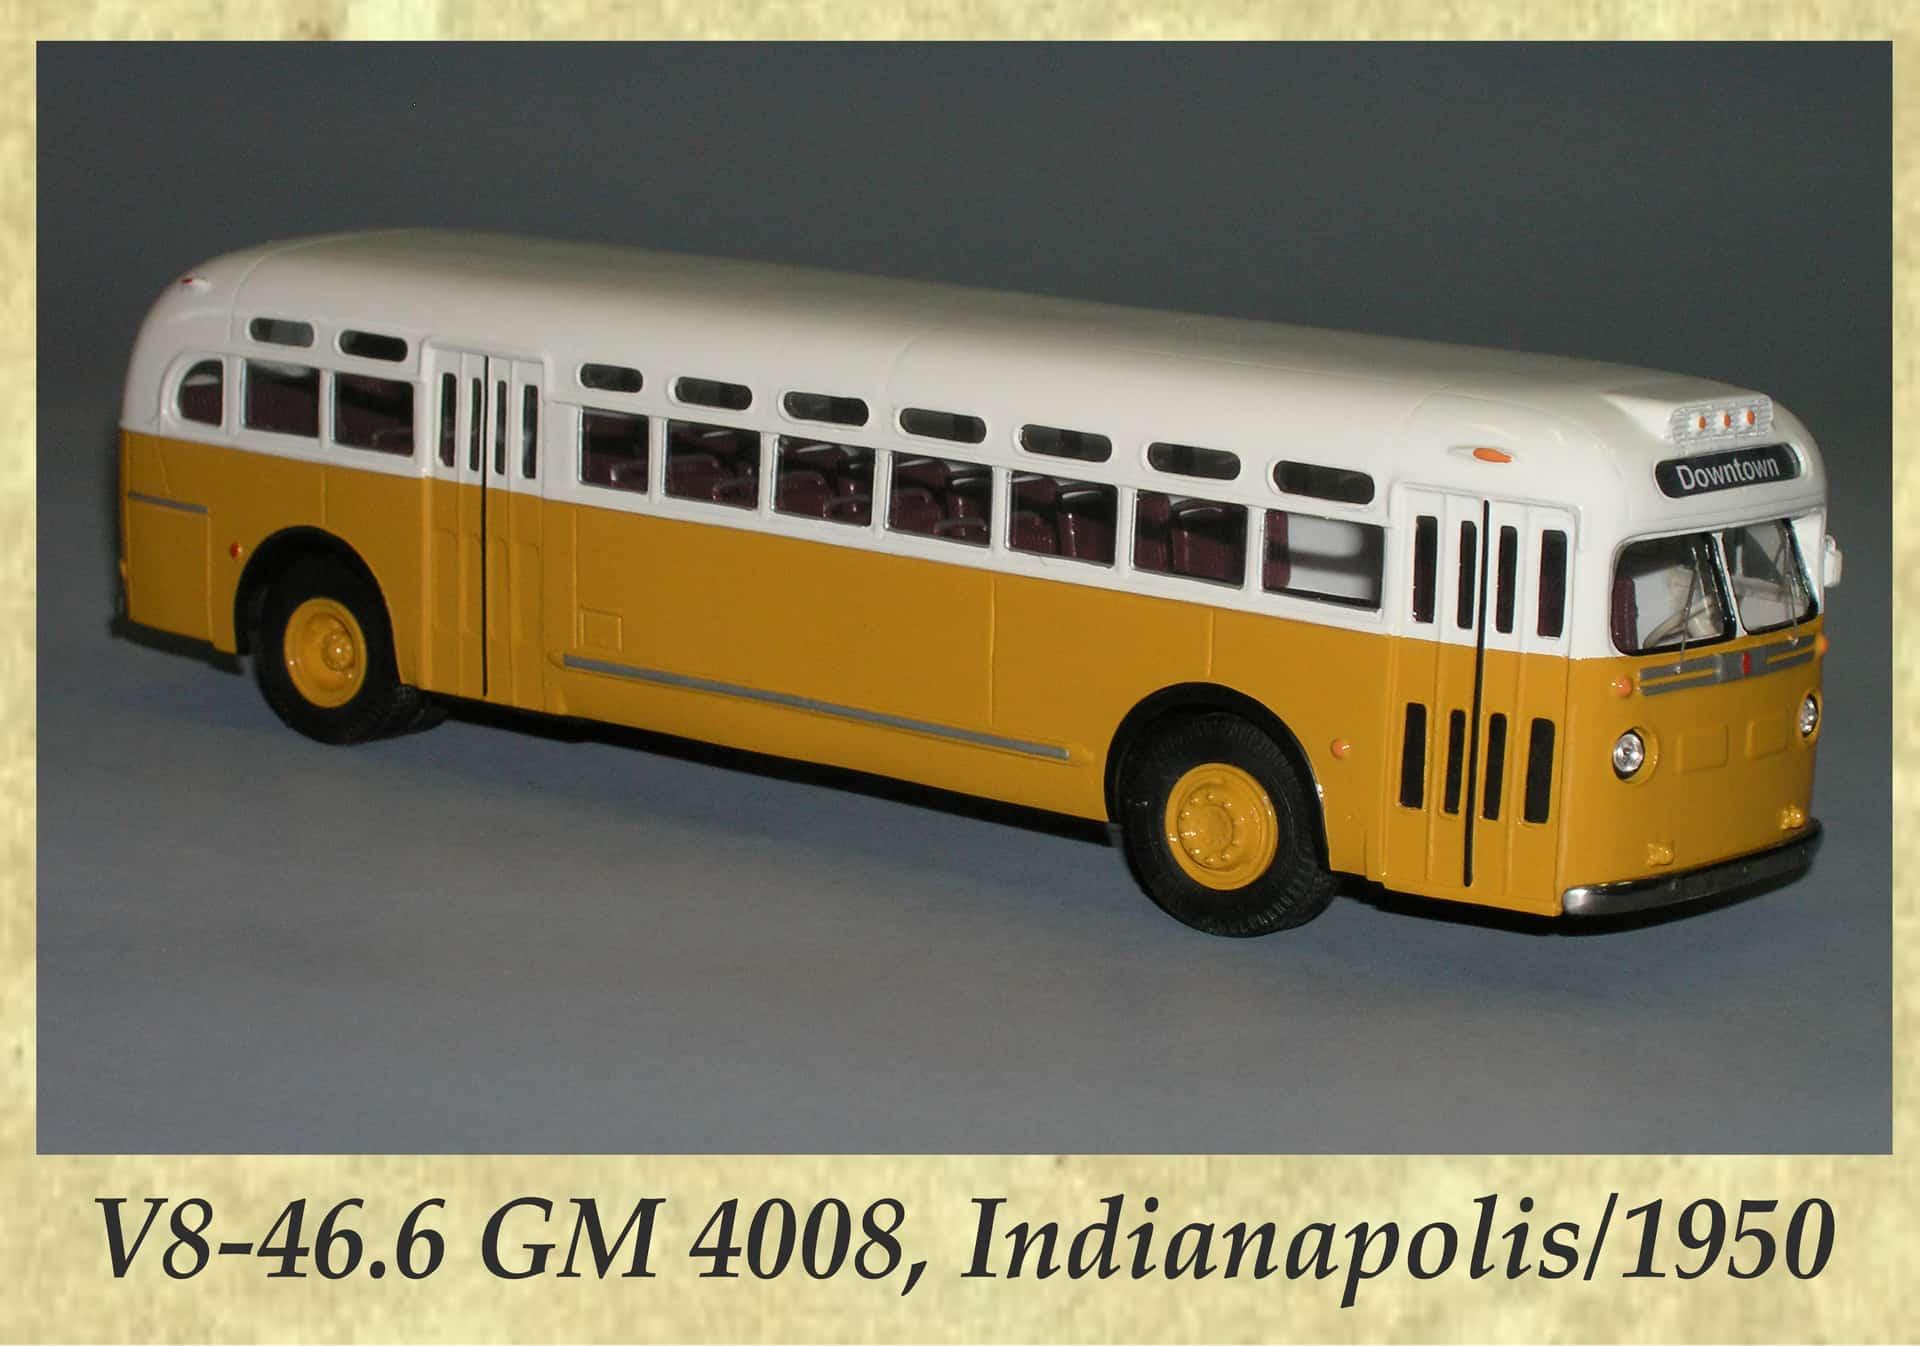 V8-46.6 GM 4008, Indianapolisn1950